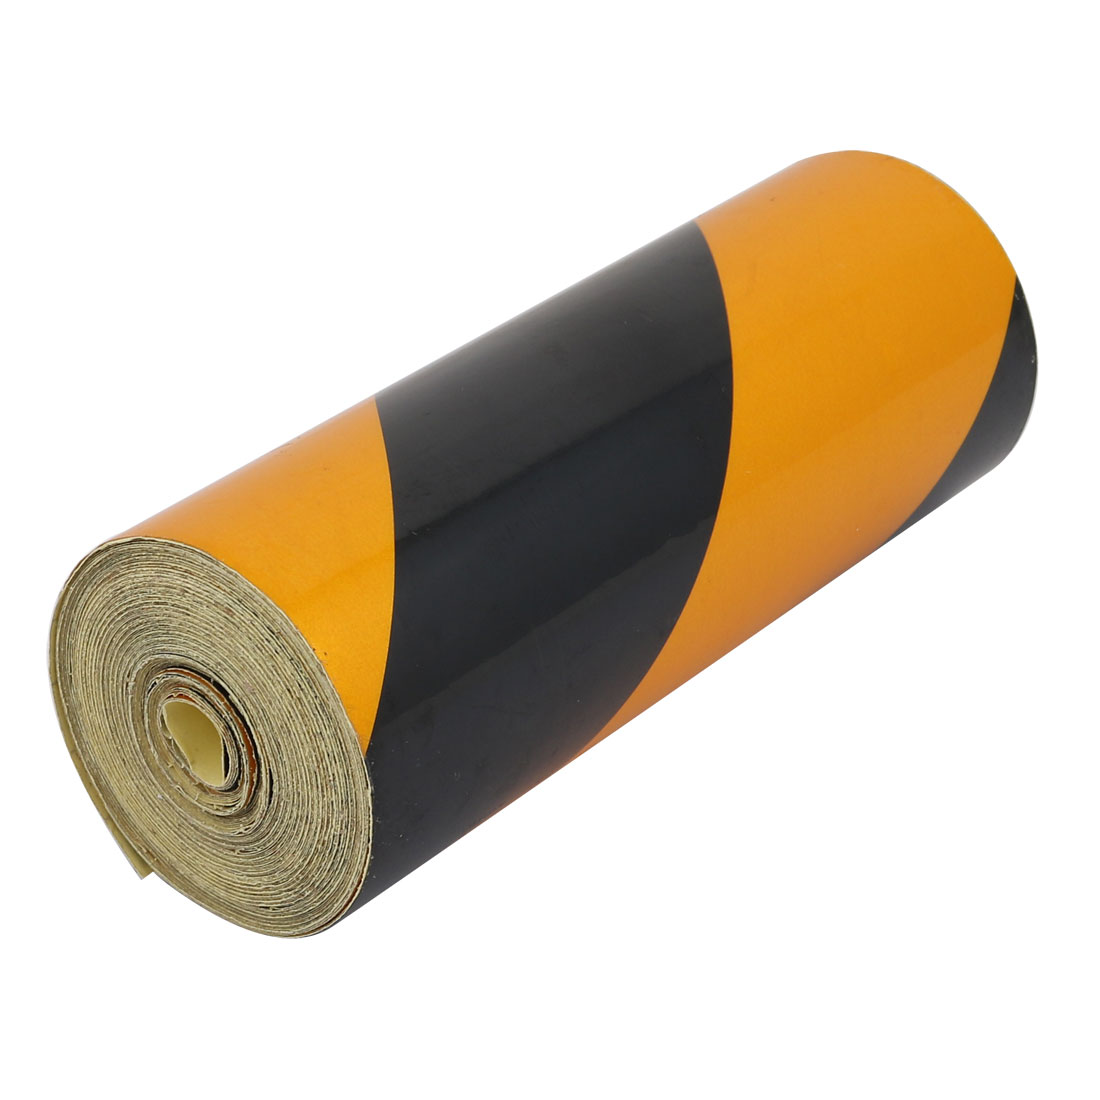 15cm Width 10M Length Single Sided Adhesive Reflective Warning Tape Yellow Black